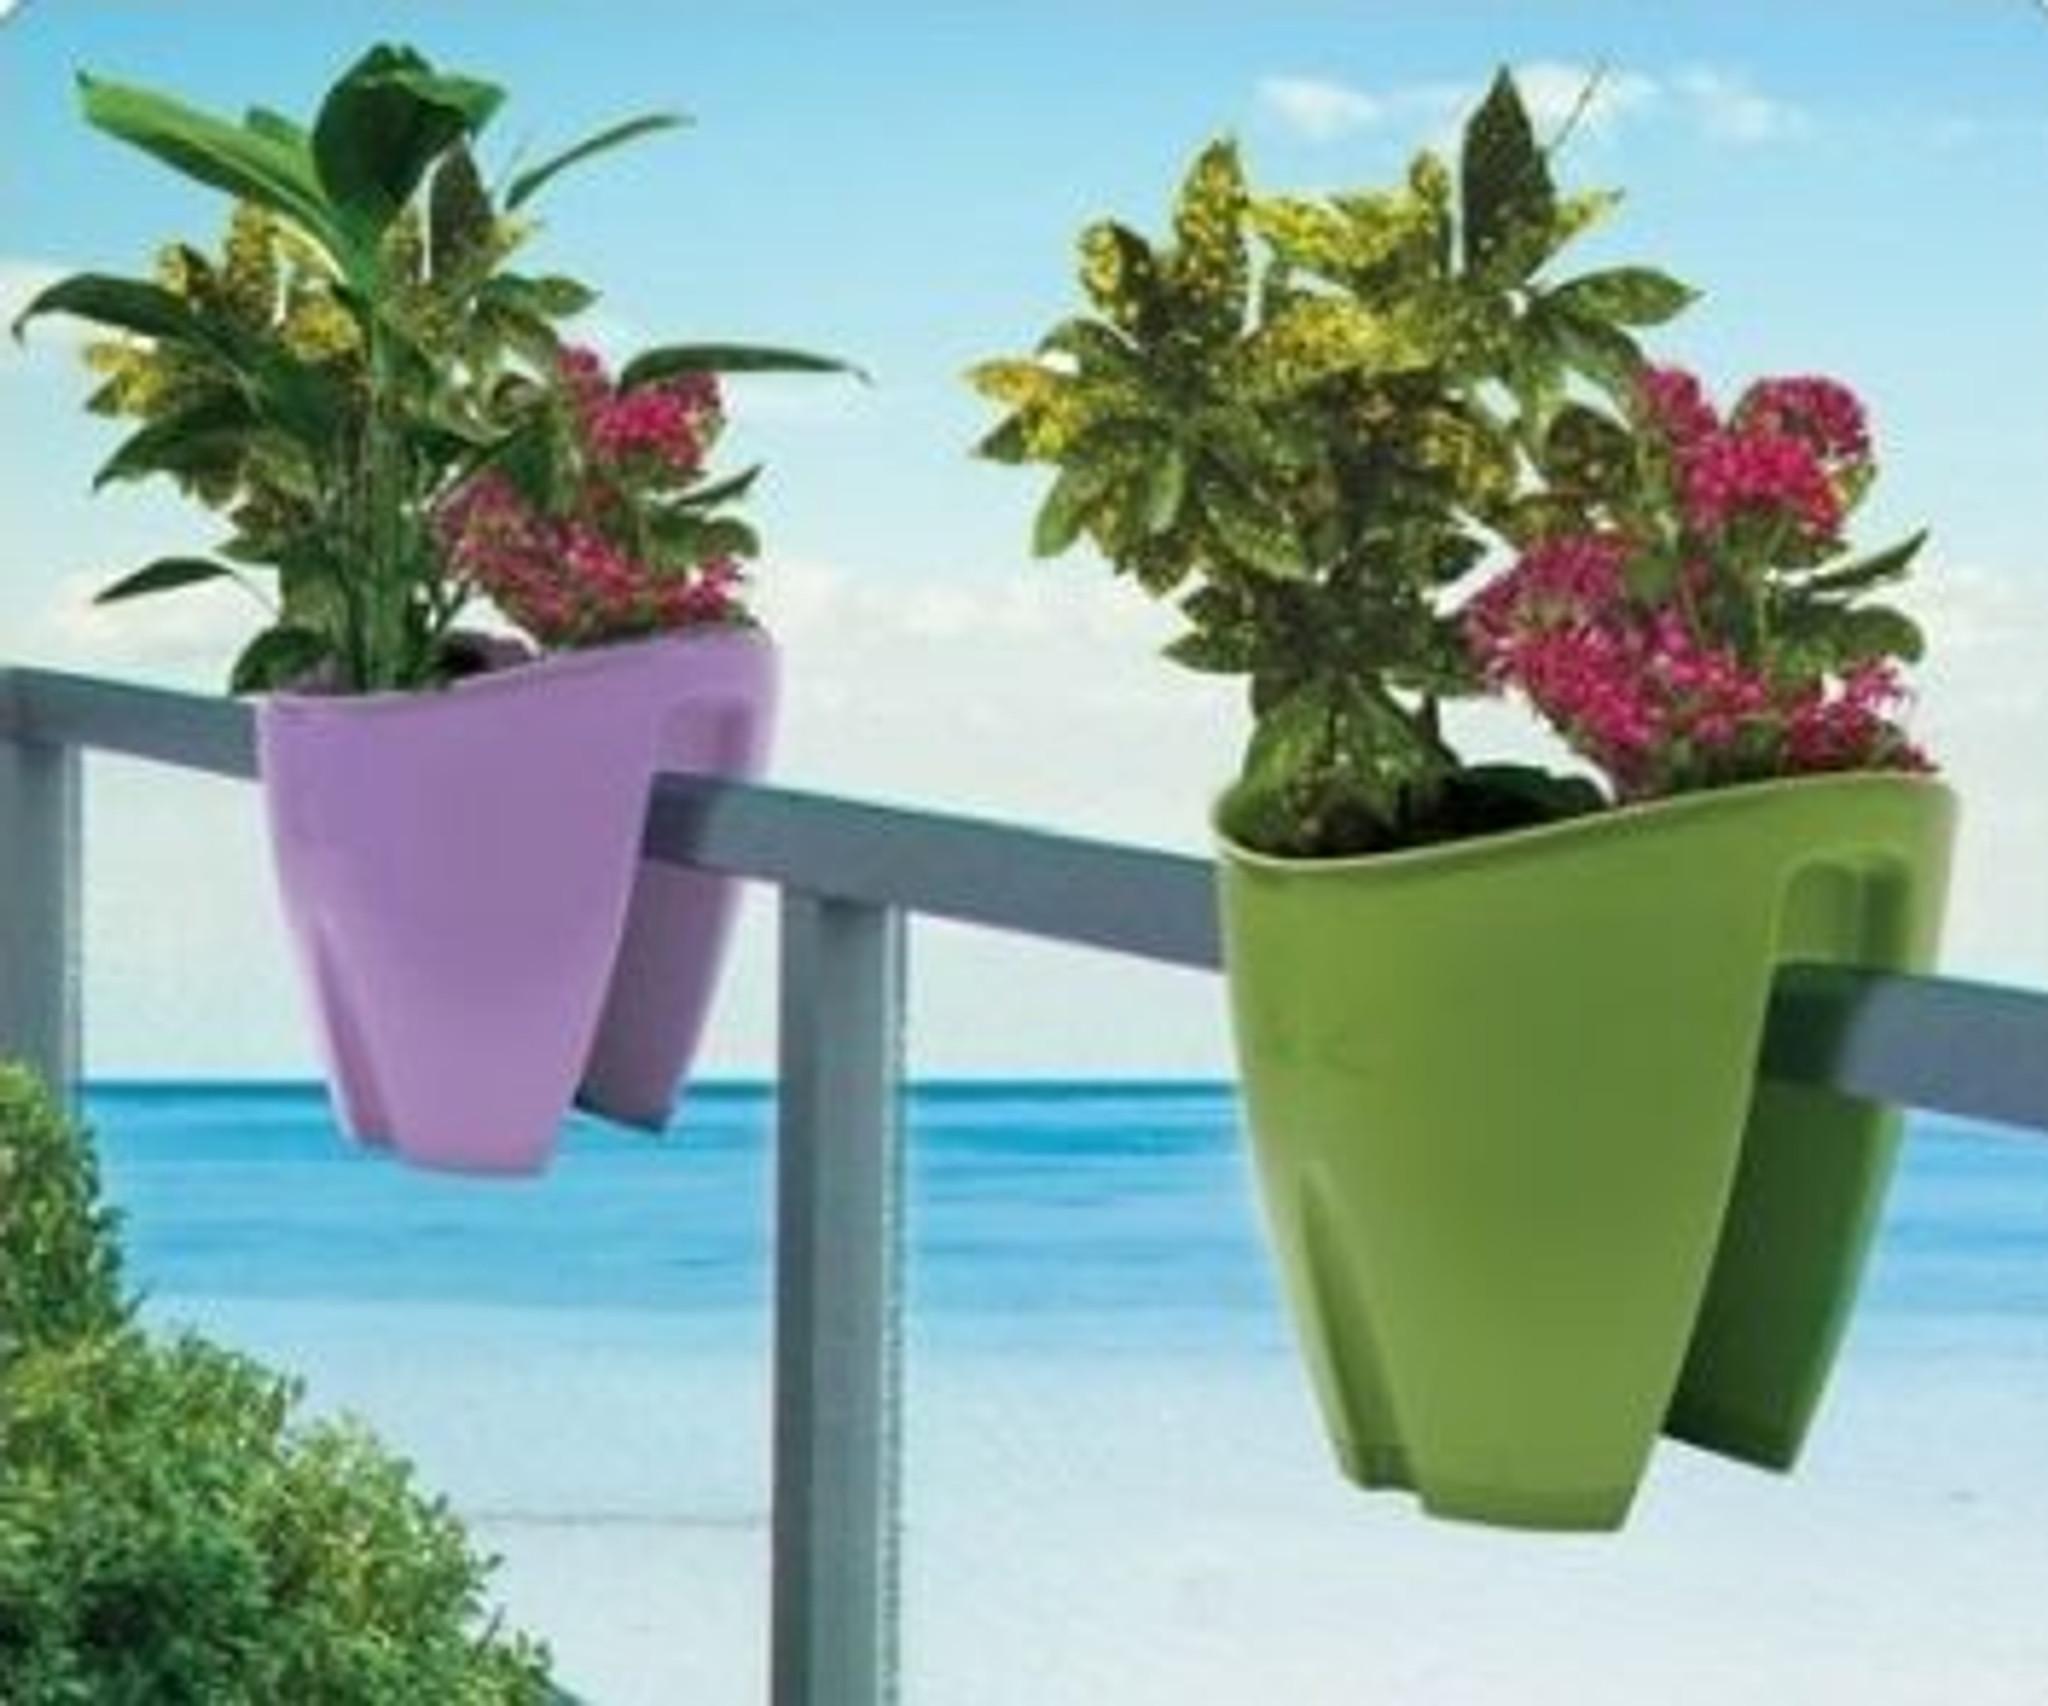 Balcony railing planter